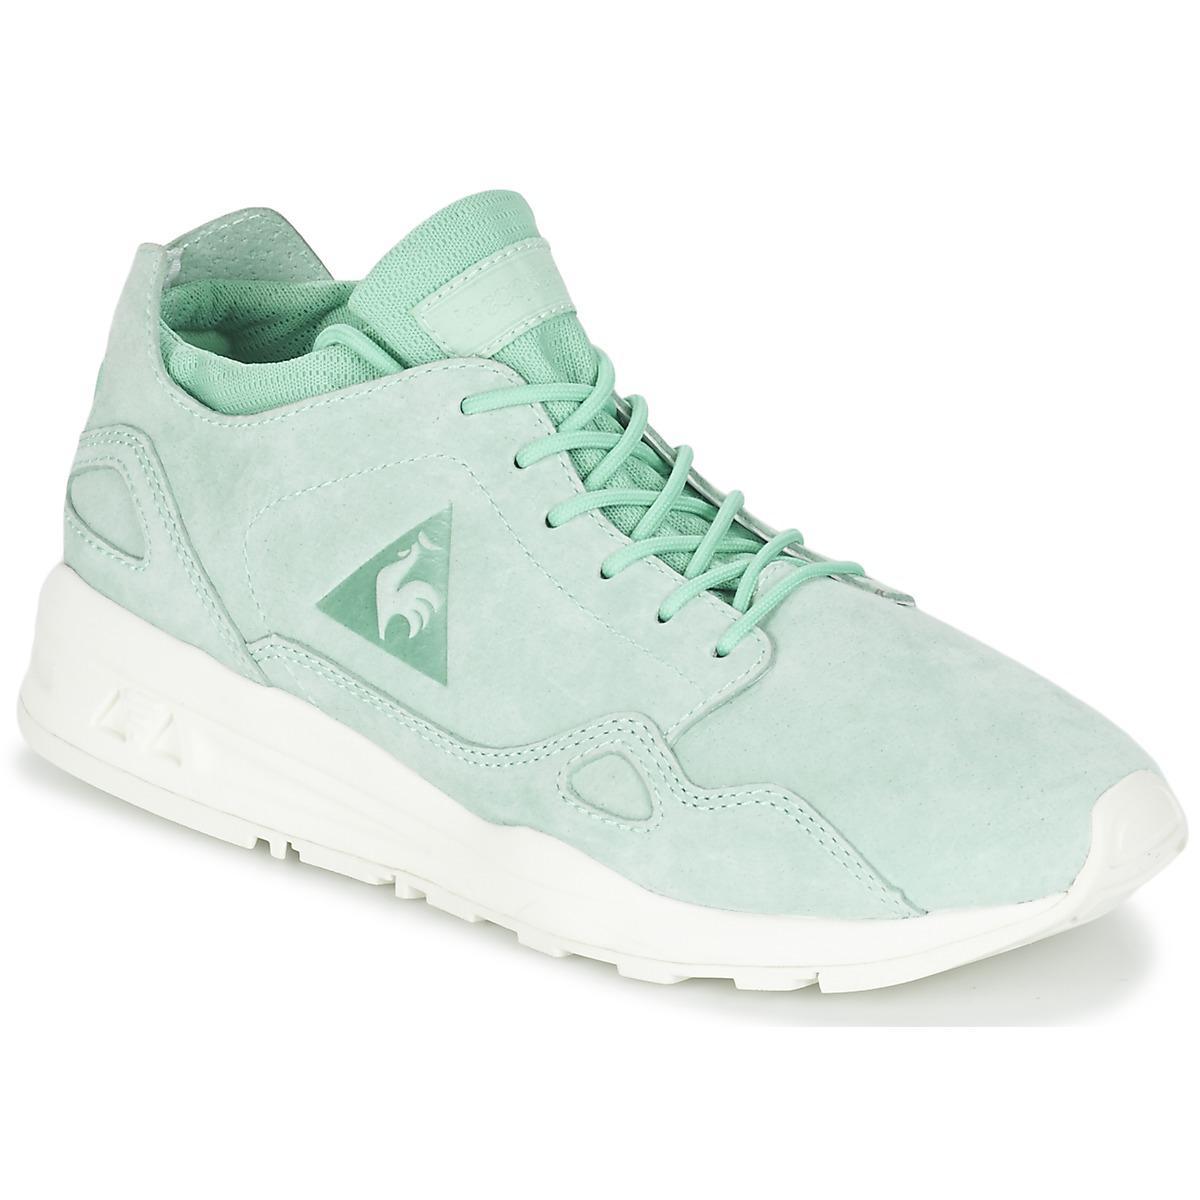 3e89ab11b493 Le Coq Sportif Lcs R Flow W Nubuck Women s Shoes (trainers) In Green ...